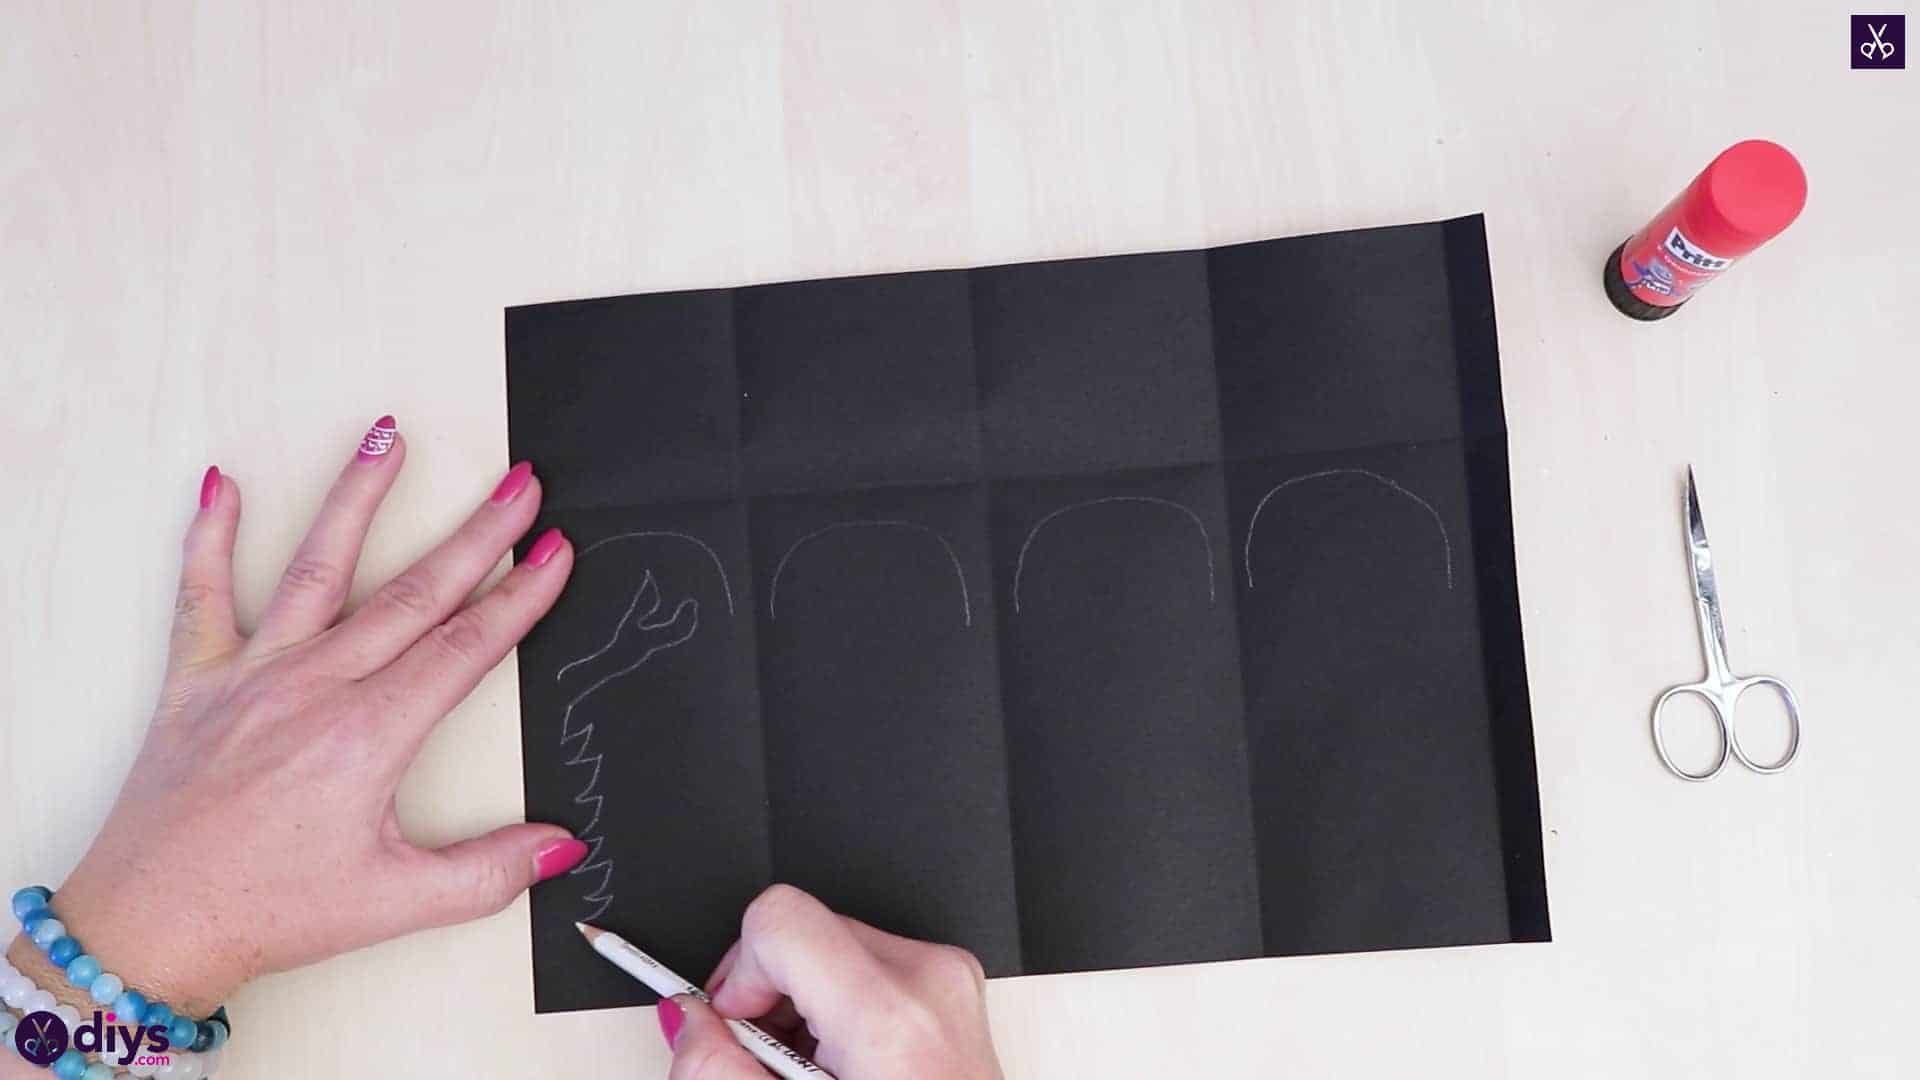 Diy paper lantern art step 3a